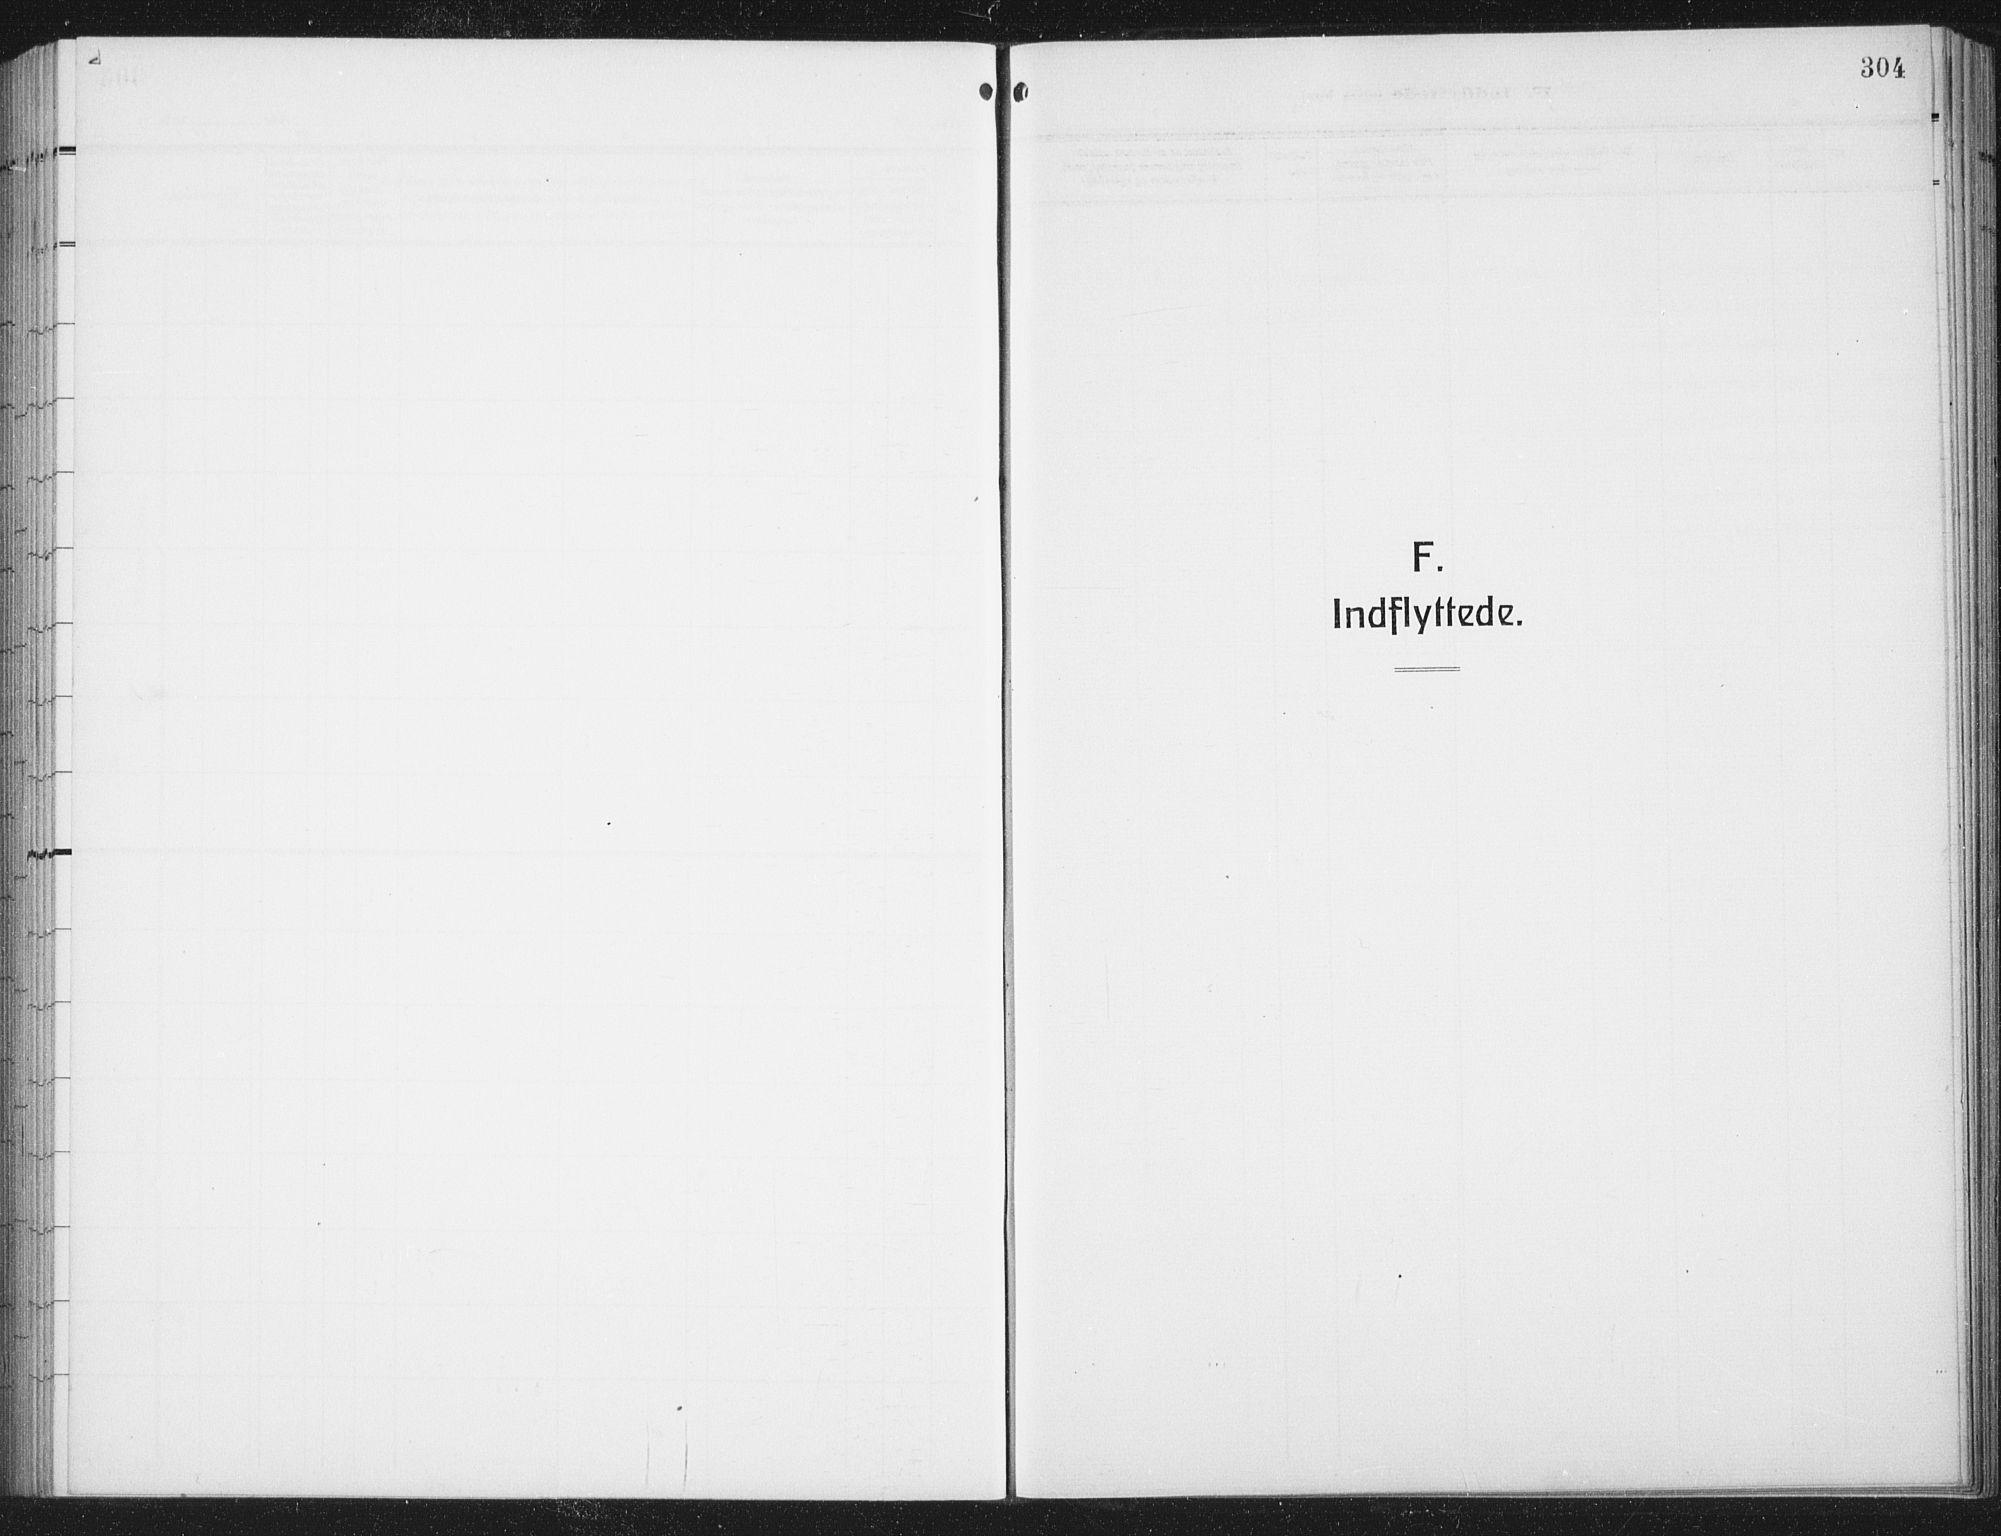 SAT, Ministerialprotokoller, klokkerbøker og fødselsregistre - Nordland, 876/L1106: Klokkerbok nr. 876C05, 1915-1942, s. 304